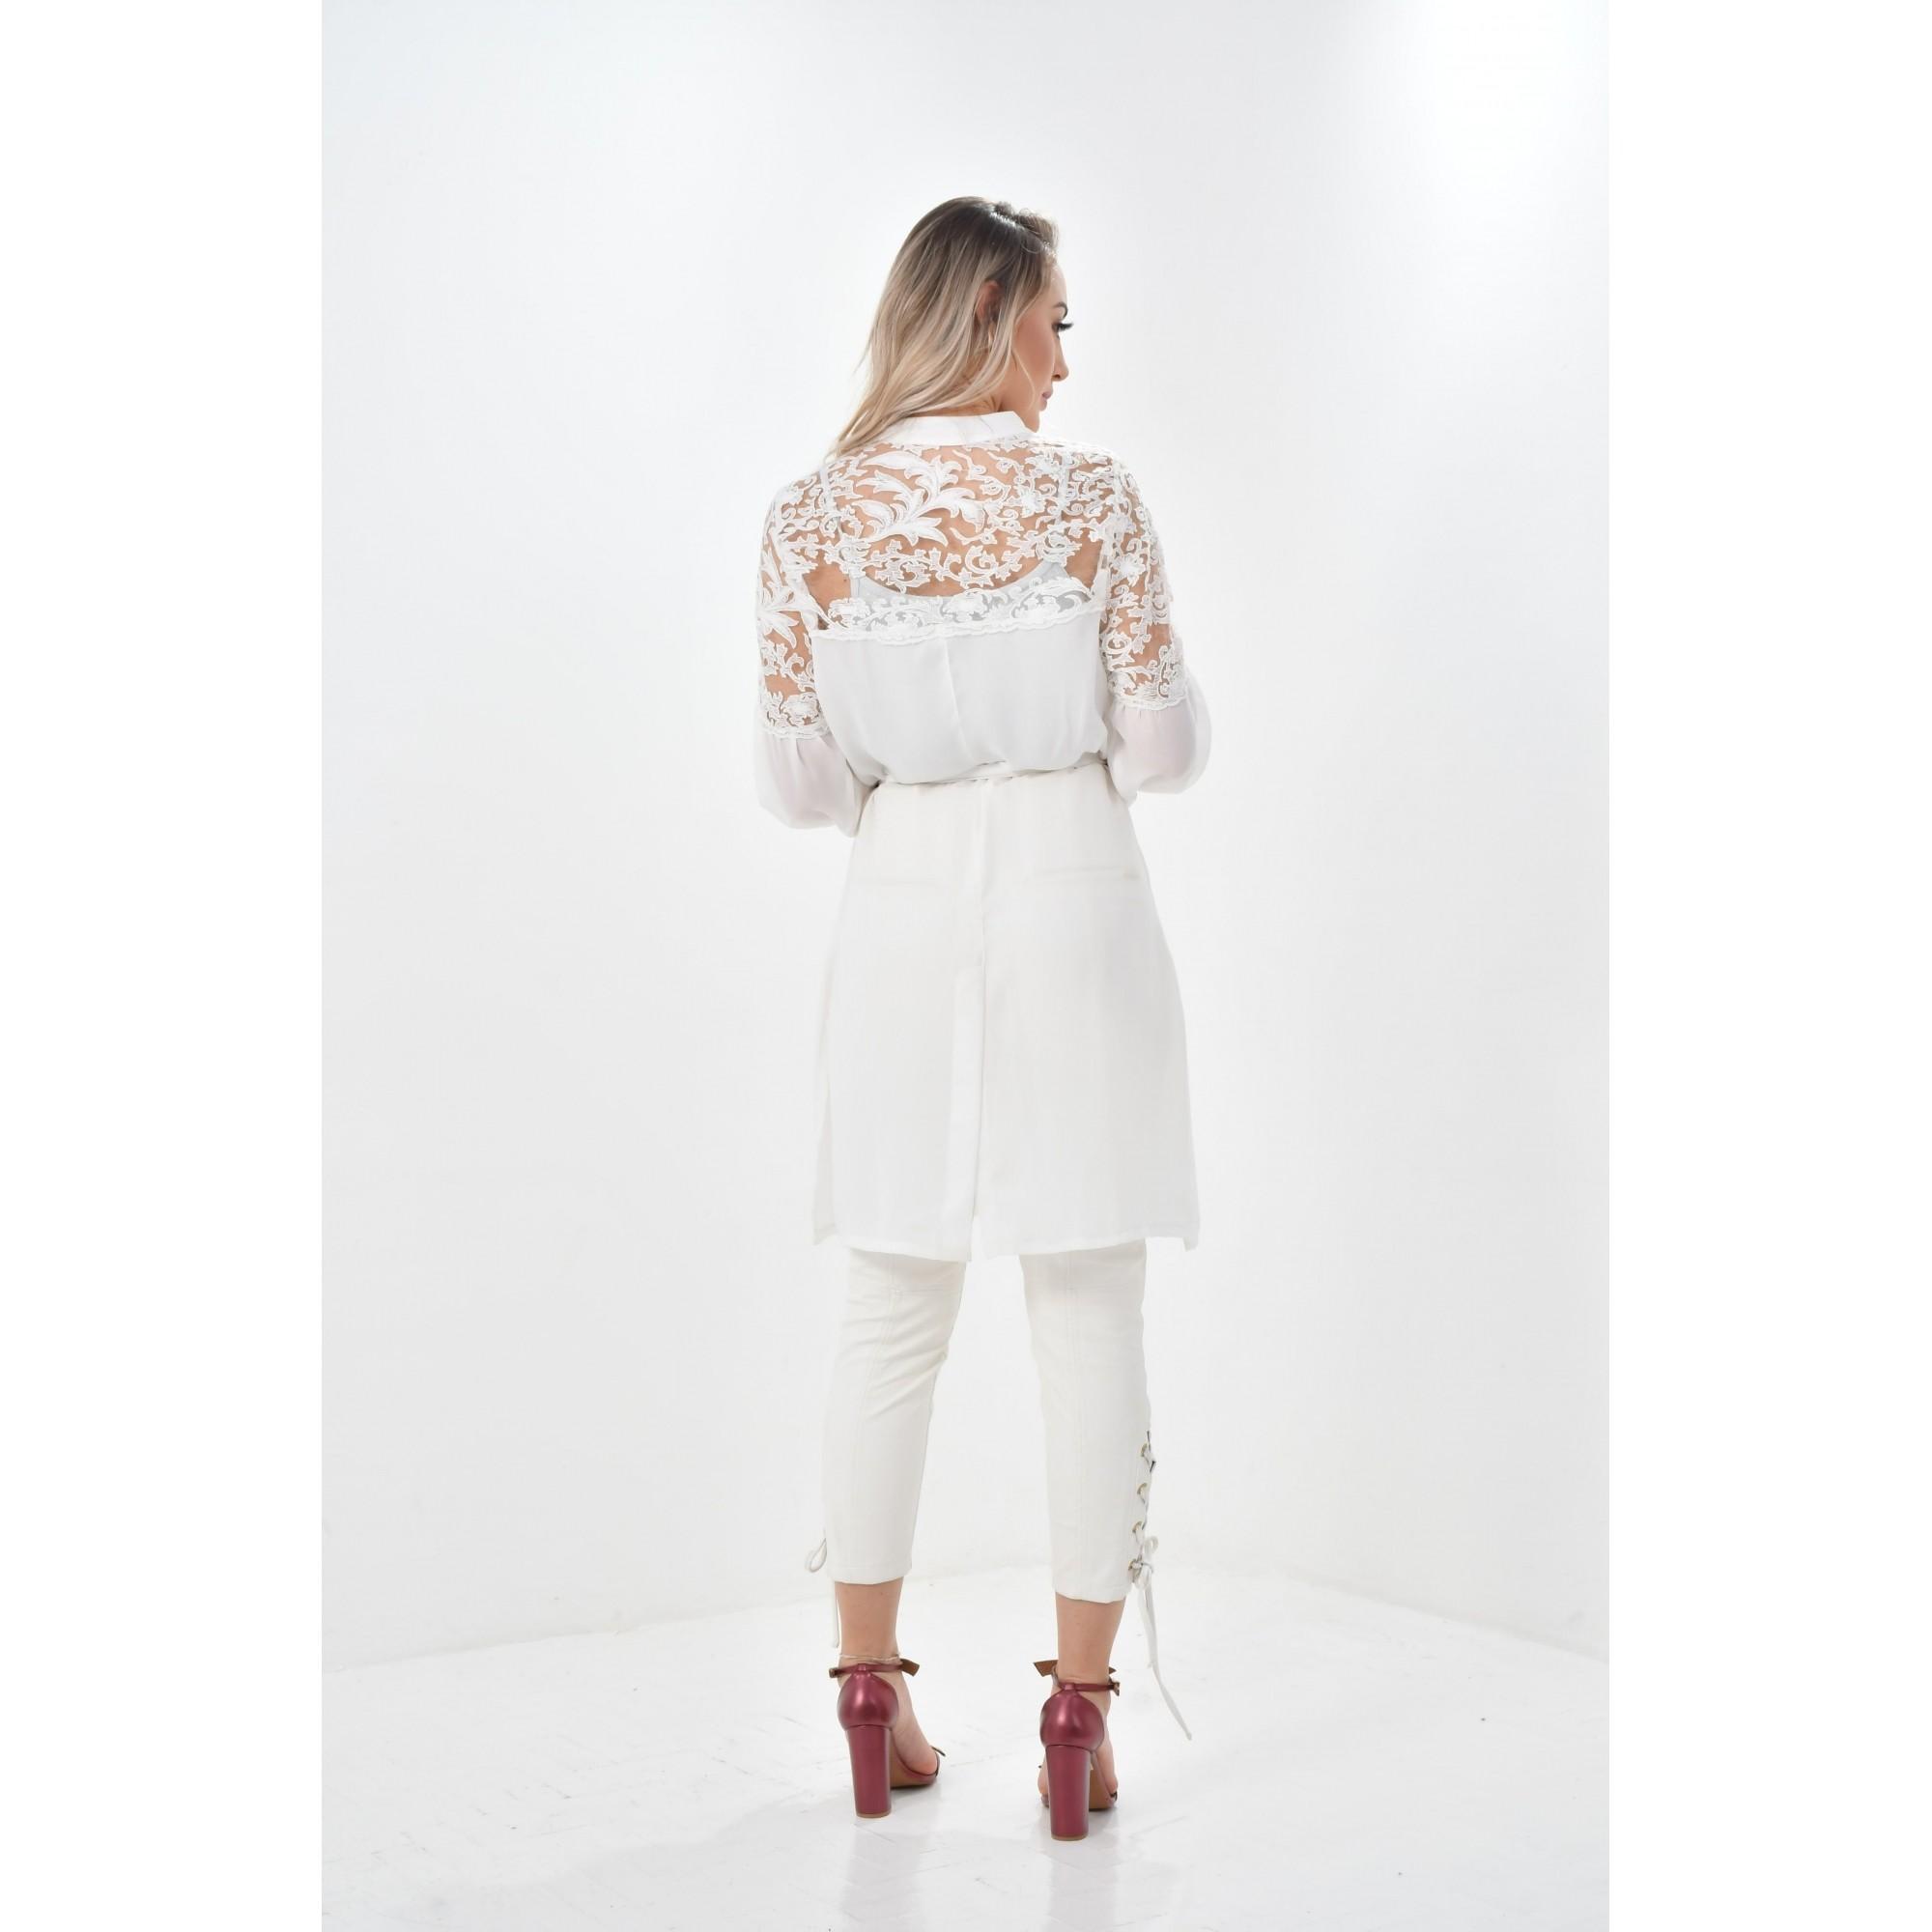 Jaleco Fabiana  - Luxo Branco - Jalecos Personalizado Feminino